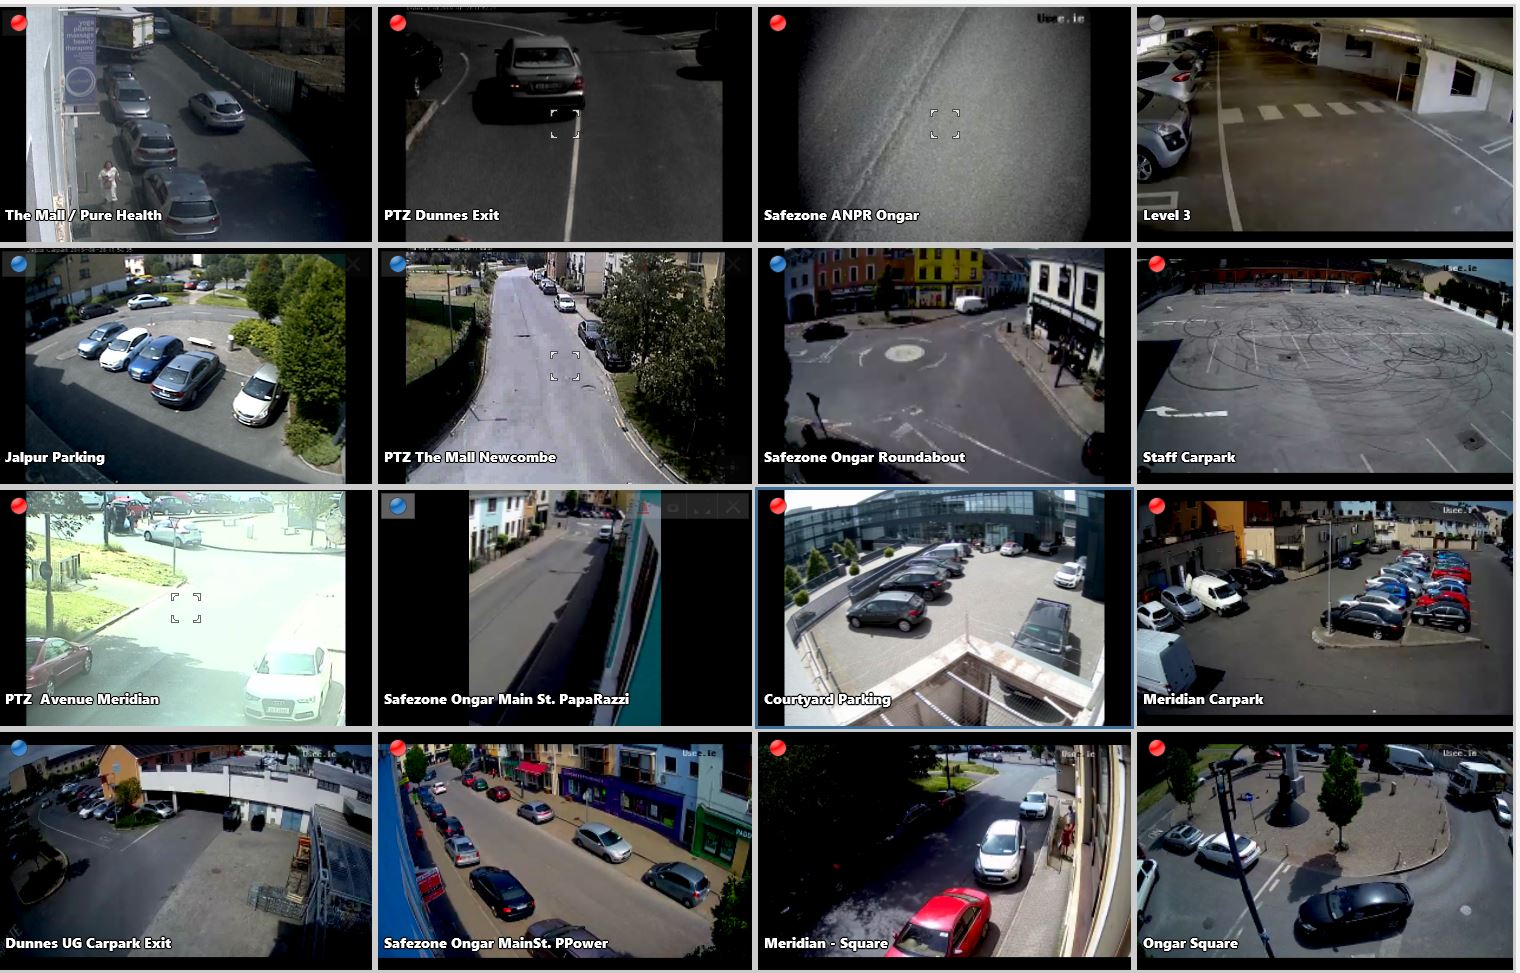 Avigilon CCTV saves time & money